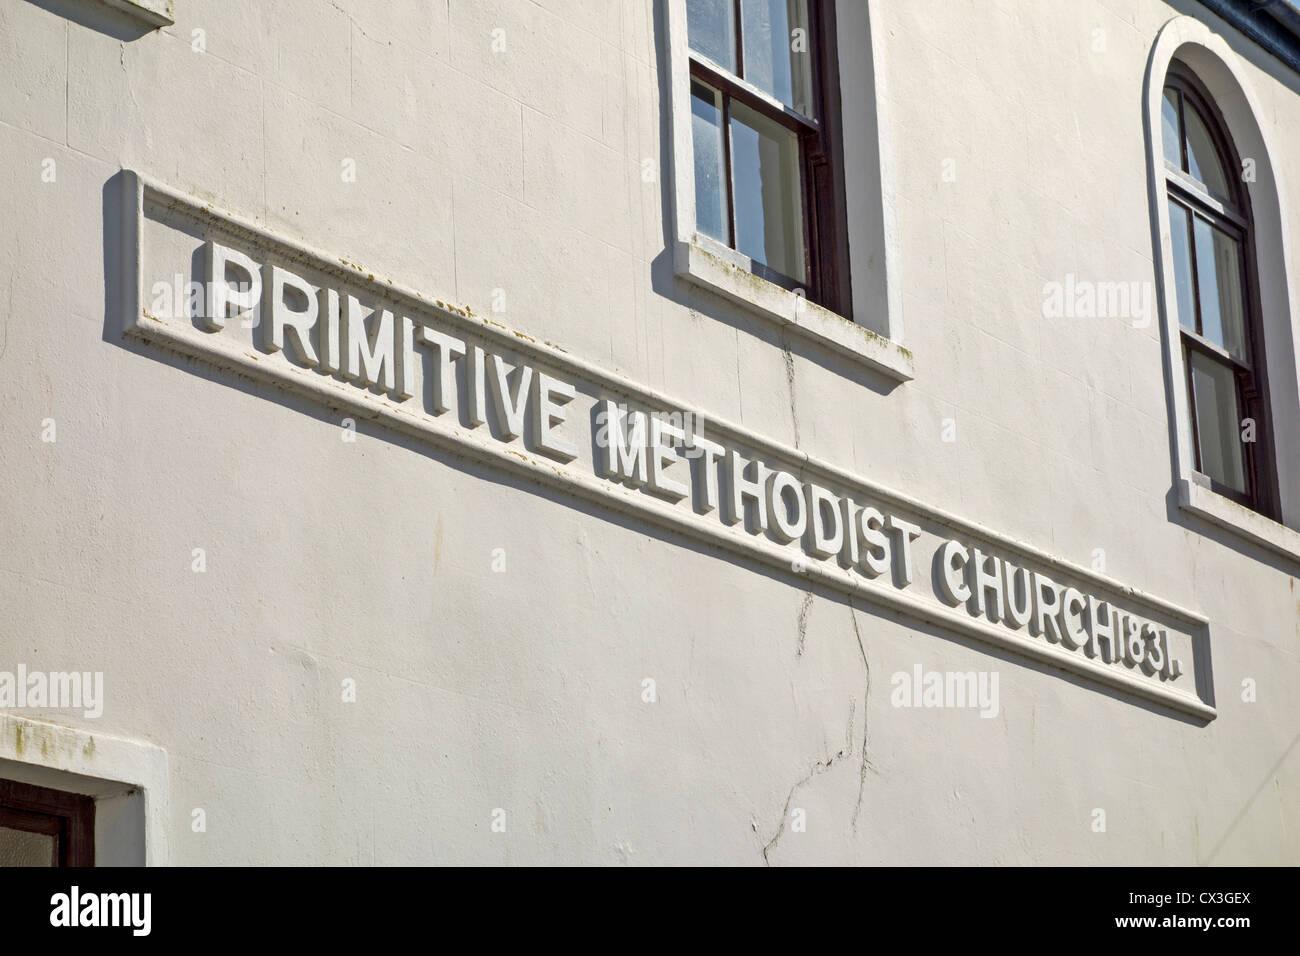 Primitive Methodist Church sign, St. Ives, Cornwall UK. - Stock Image